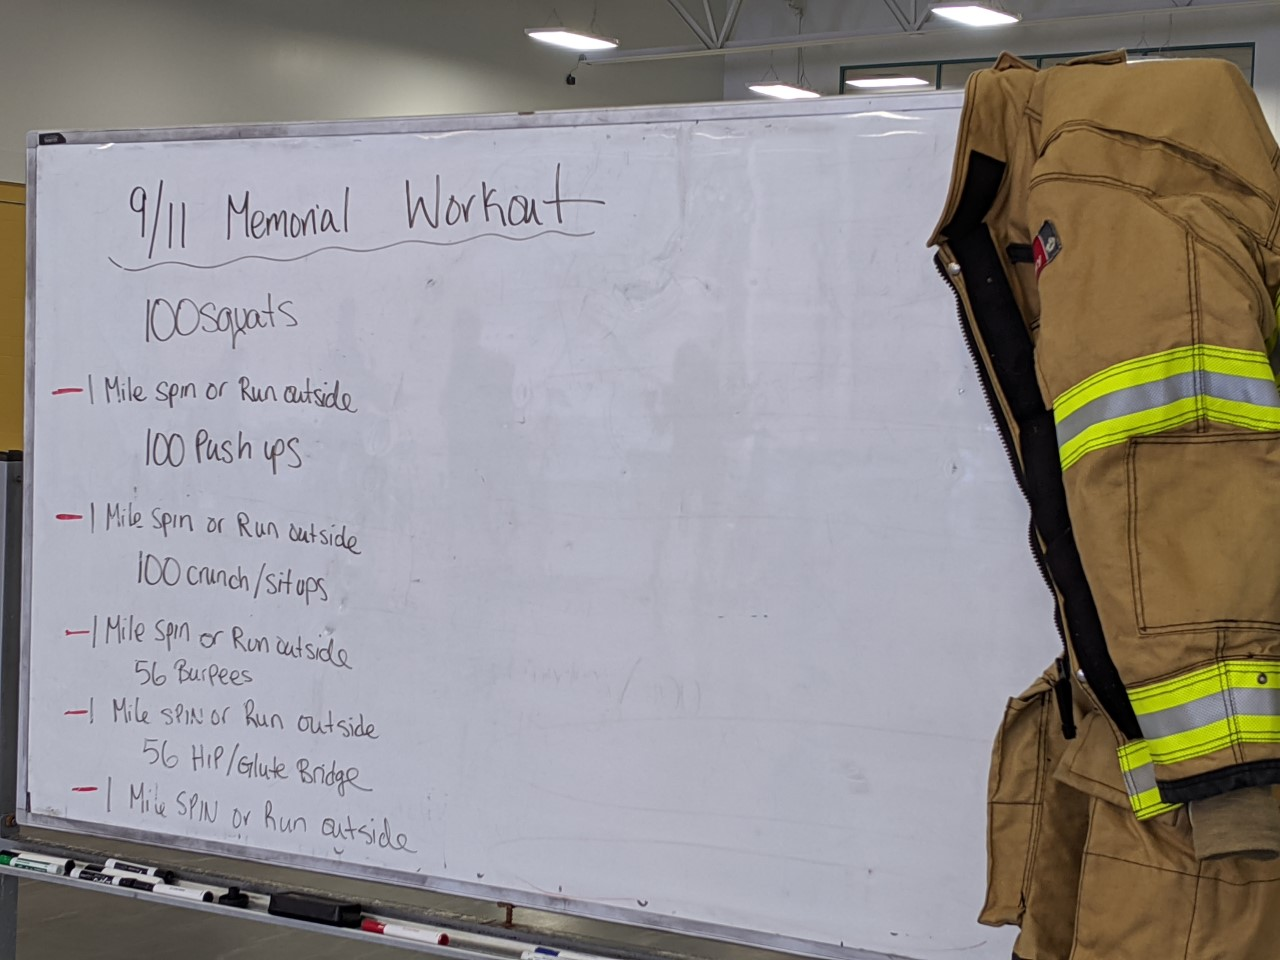 911 Memorial Workout 4.jpg